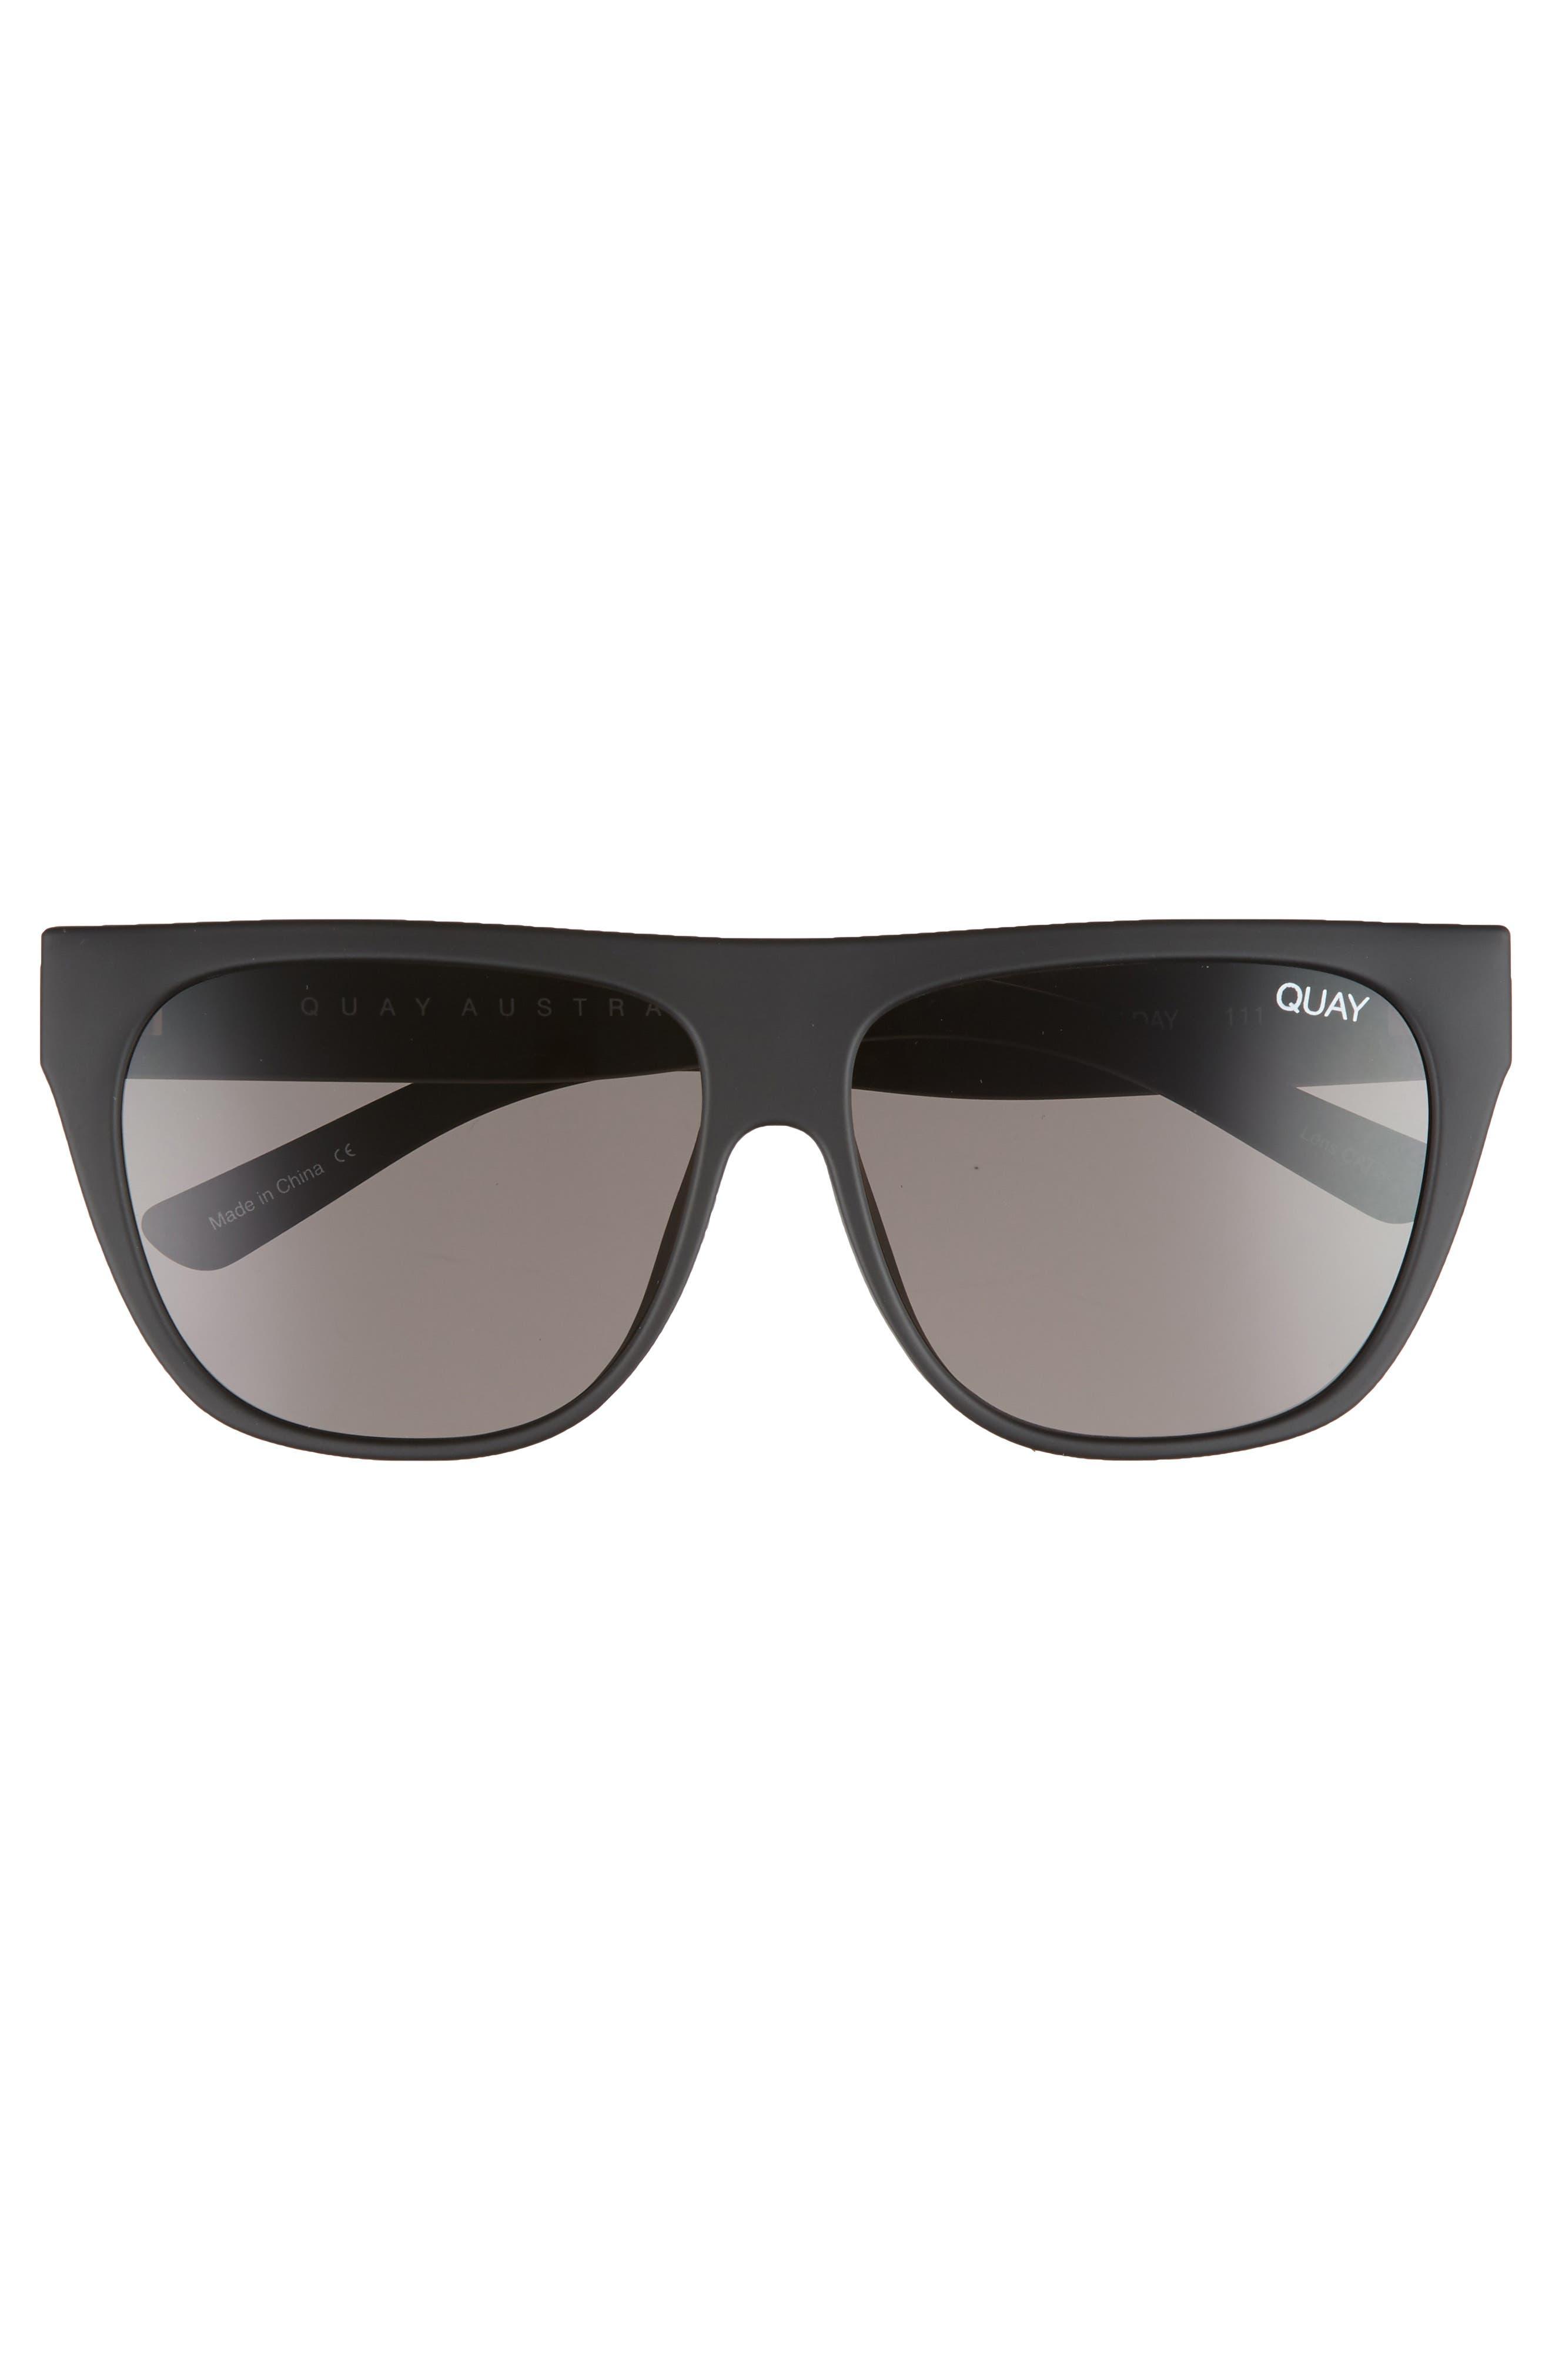 x Tony Bianco Drama by Day 55mm Square Sunglasses,                             Alternate thumbnail 3, color,                             Black/ Smoke